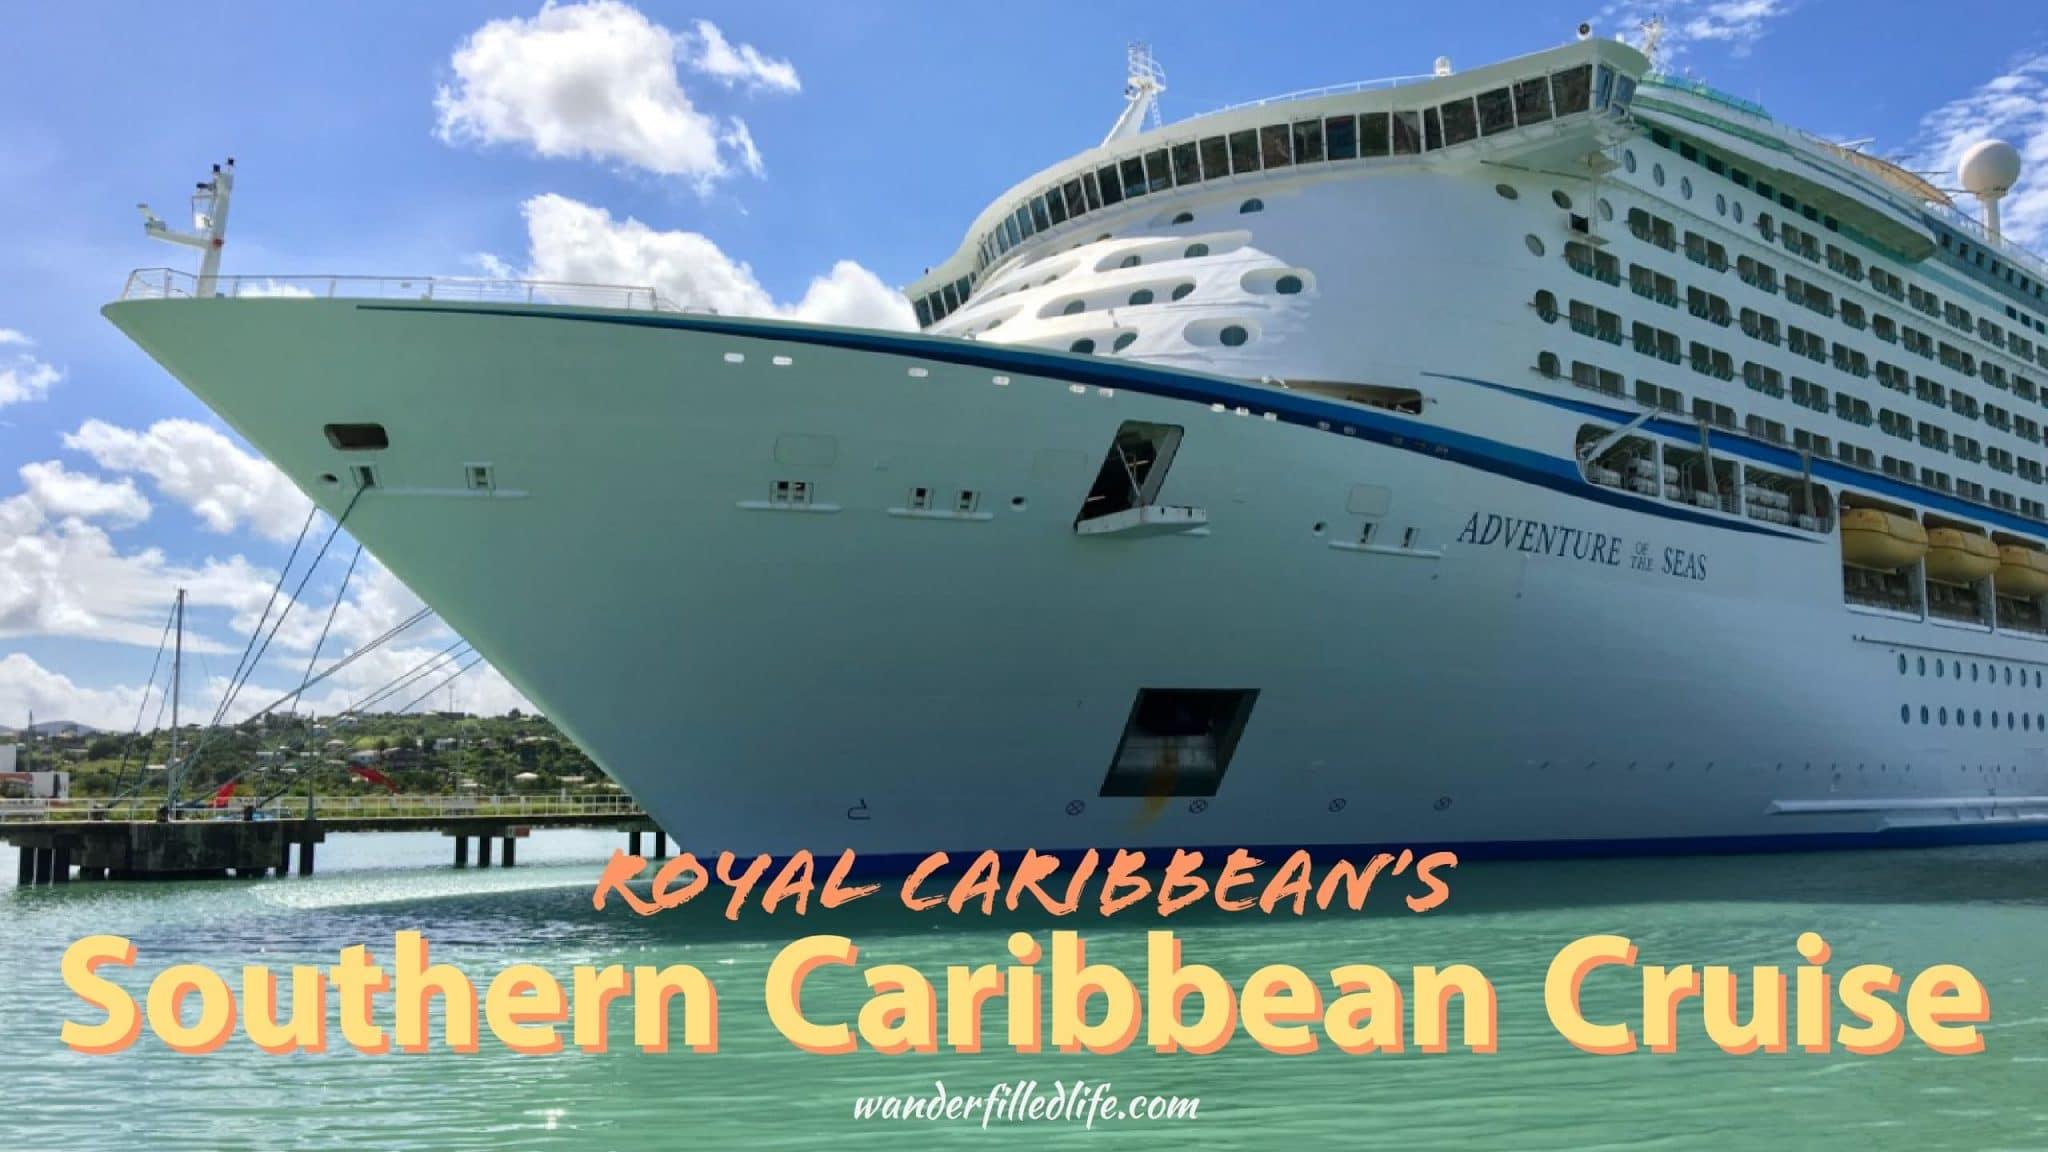 Royal Caribbean's Southern Caribbean Cruise